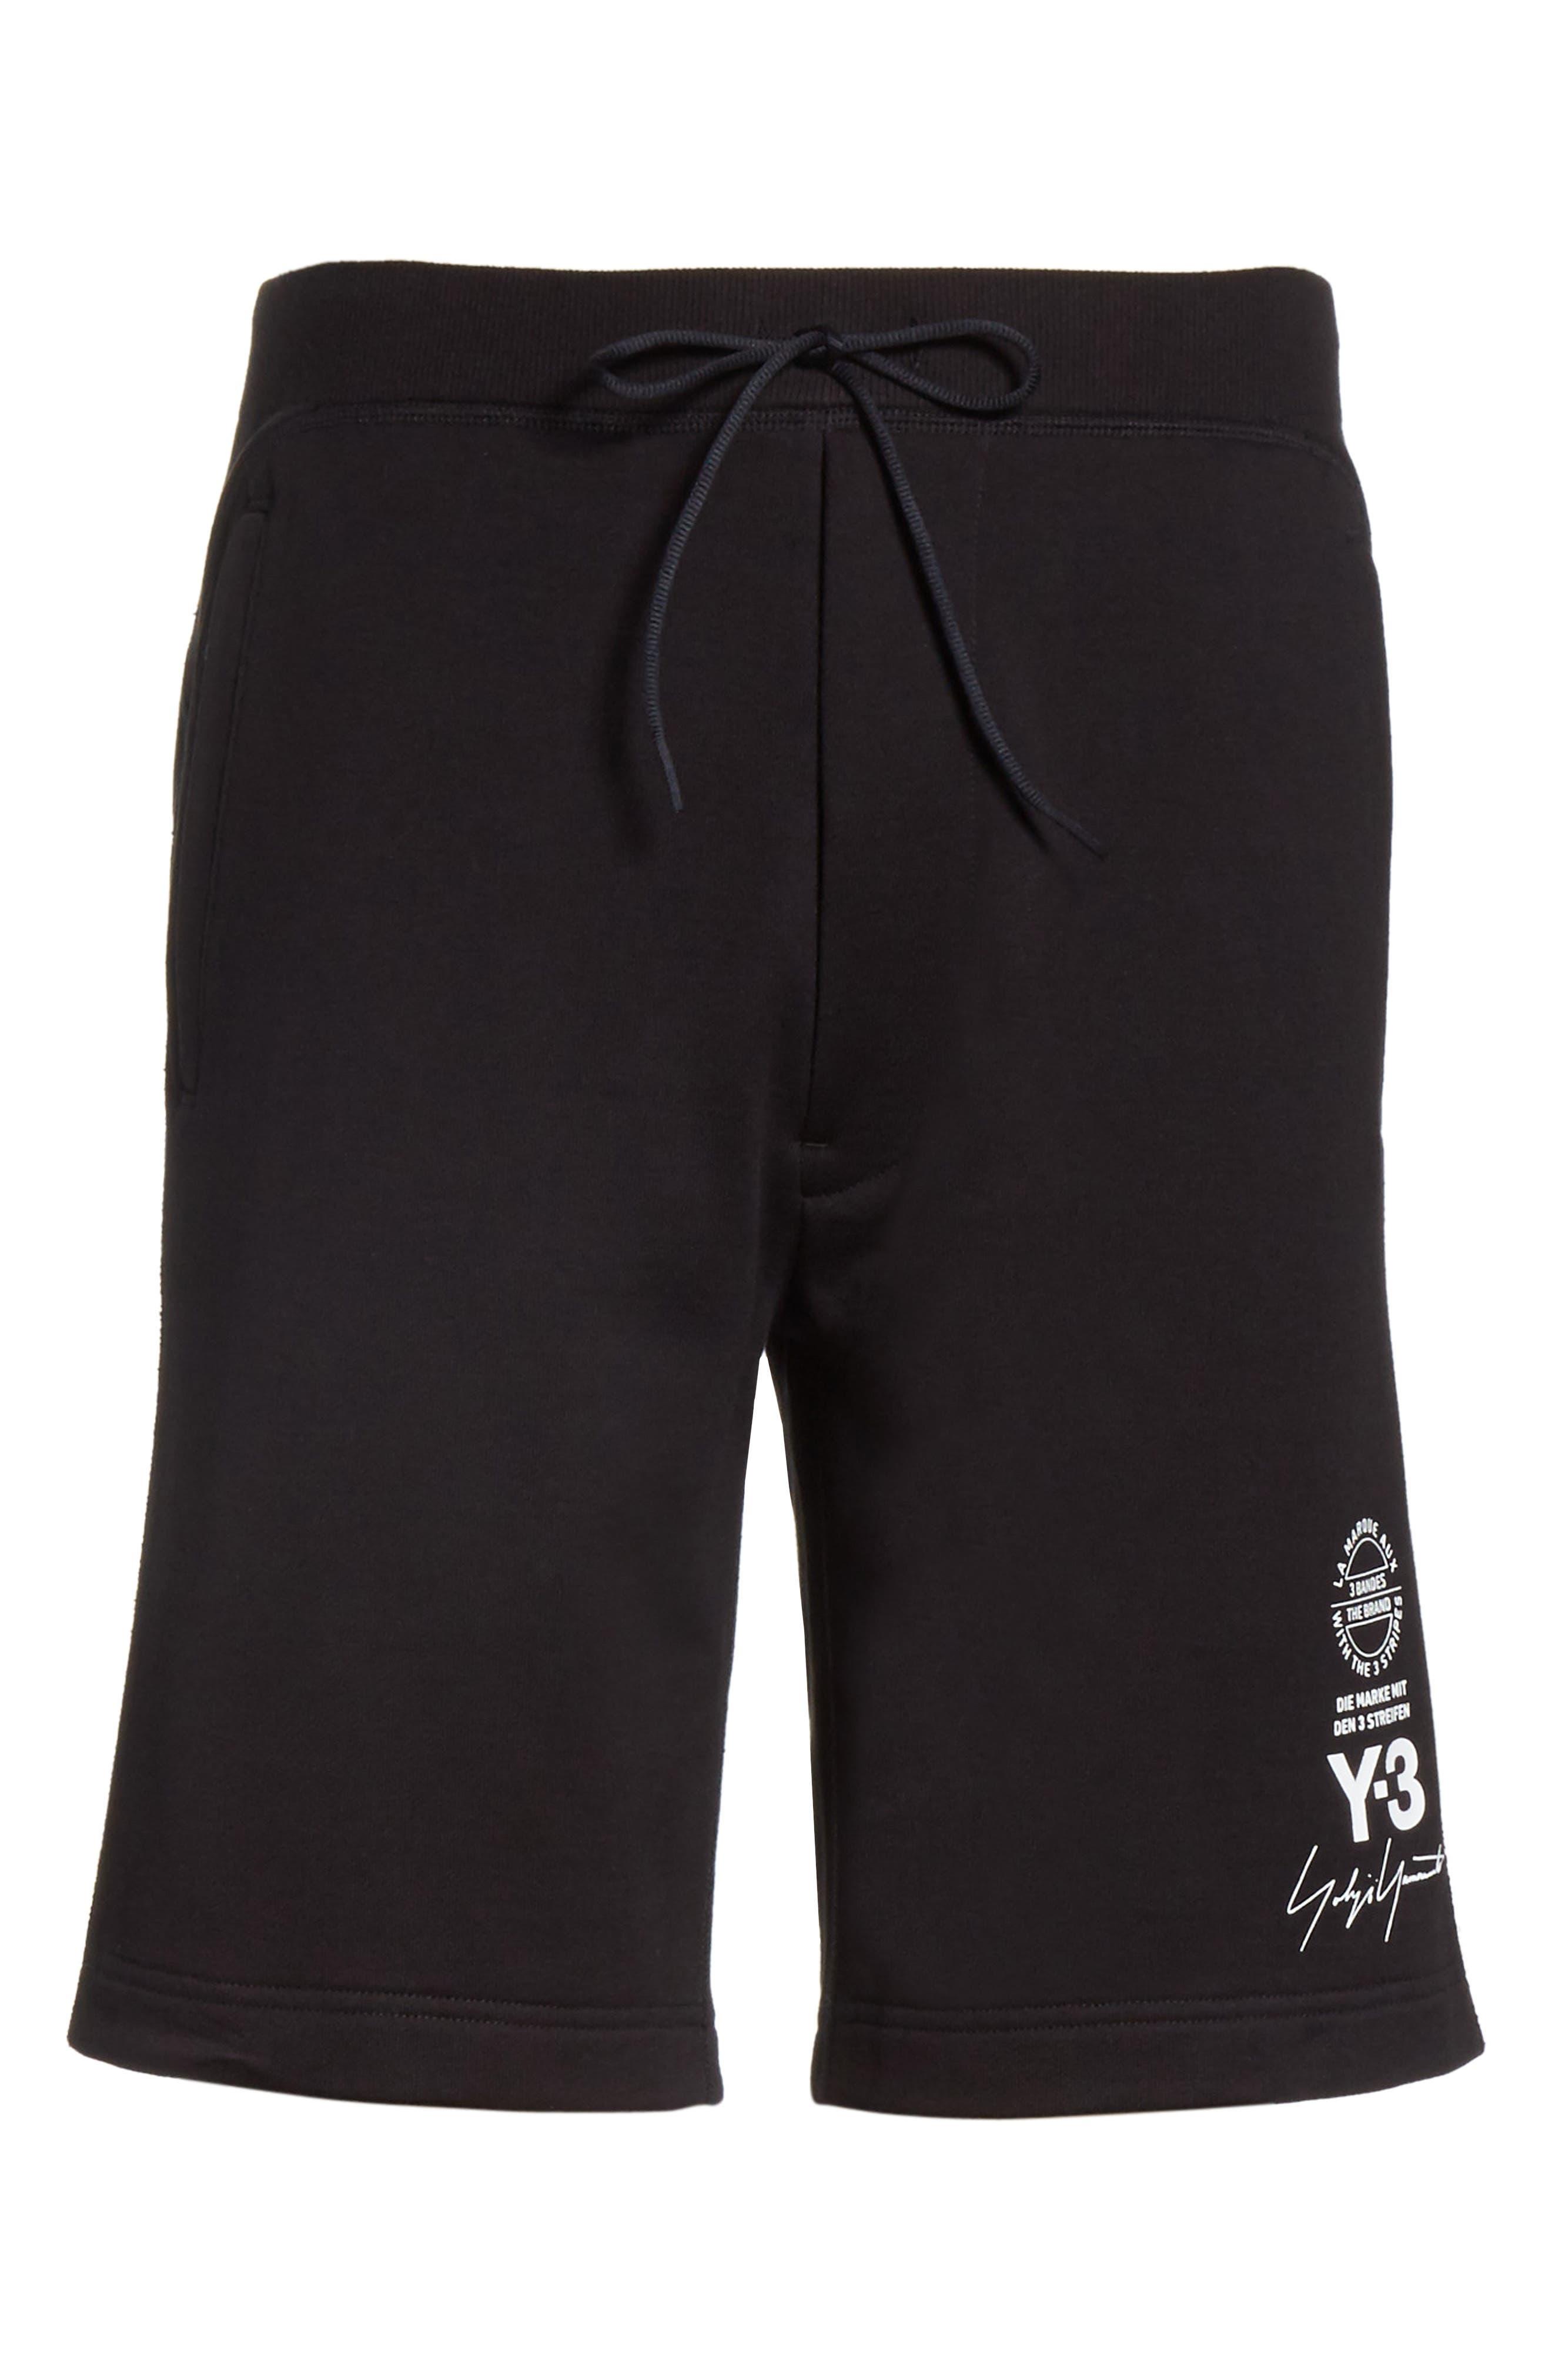 x adidas Track Shorts,                             Alternate thumbnail 6, color,                             001